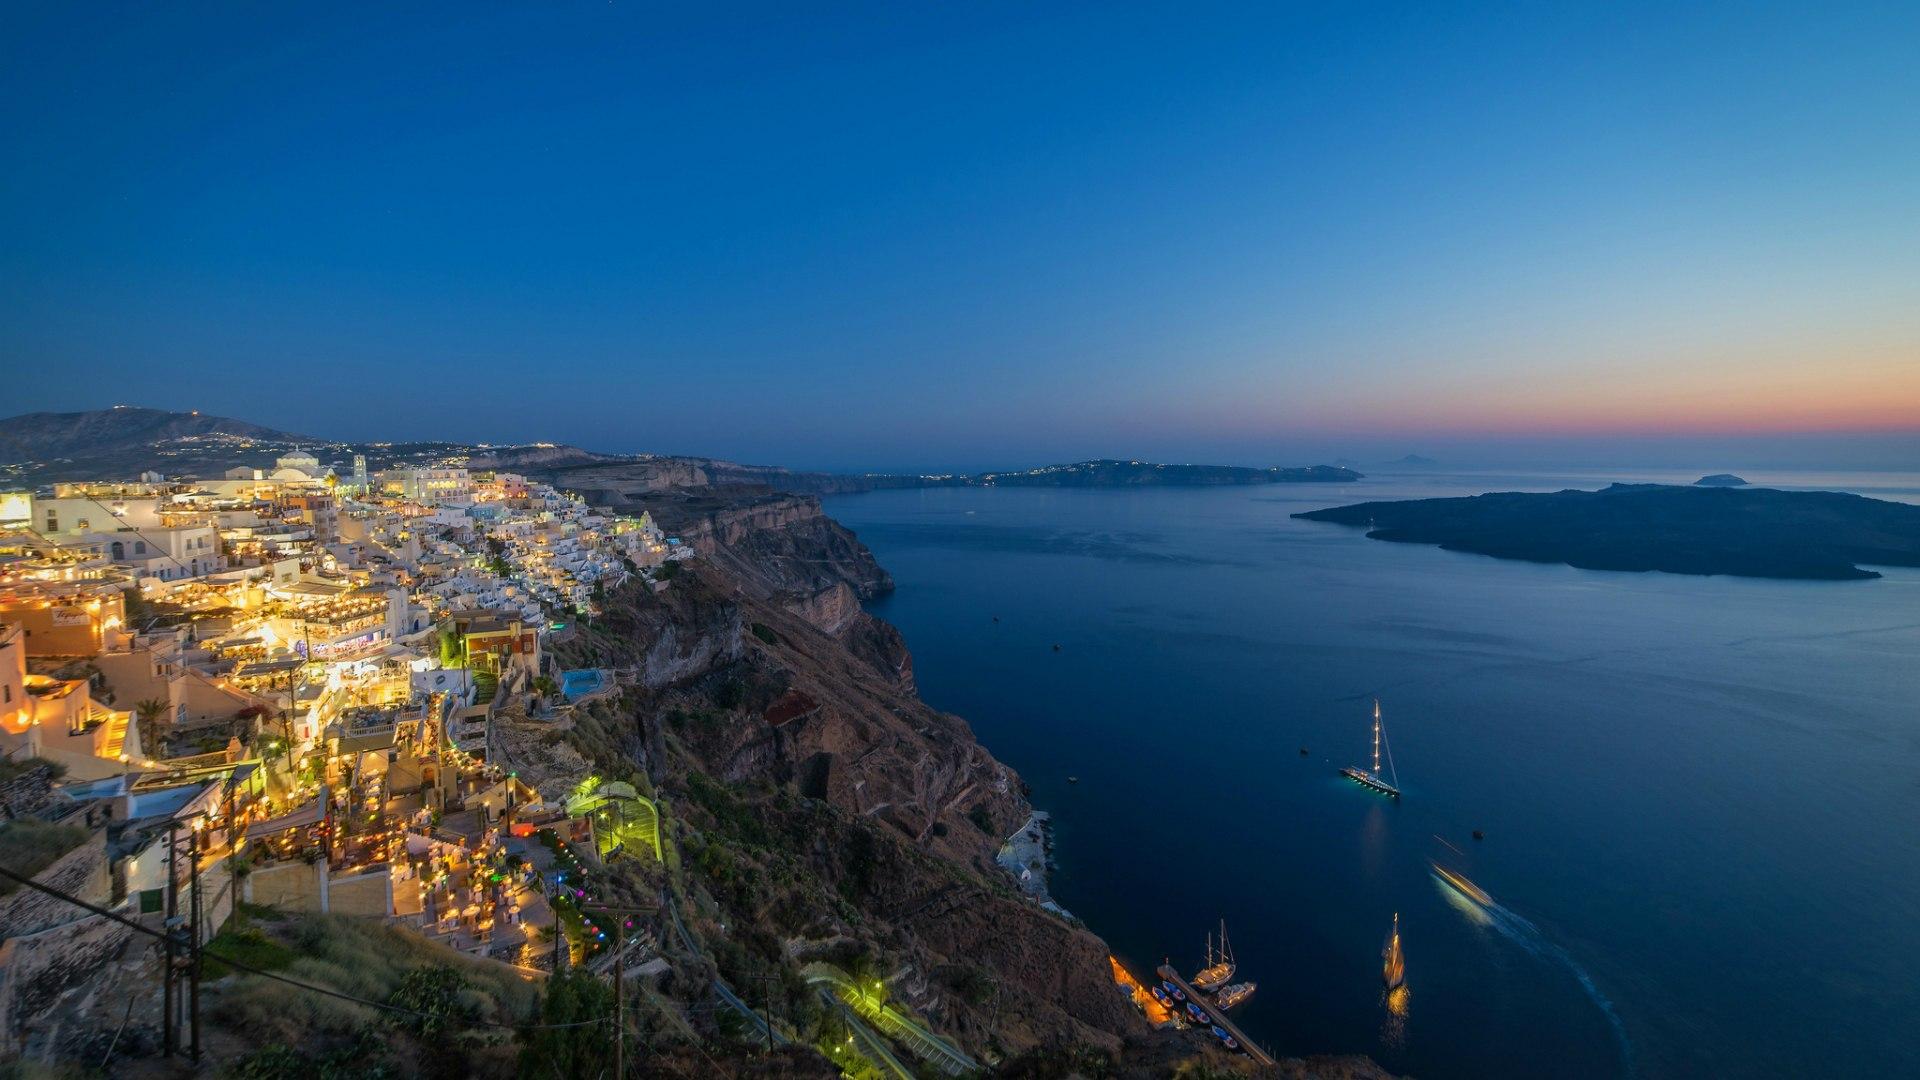 wallpaper santorini greece island - photo #31